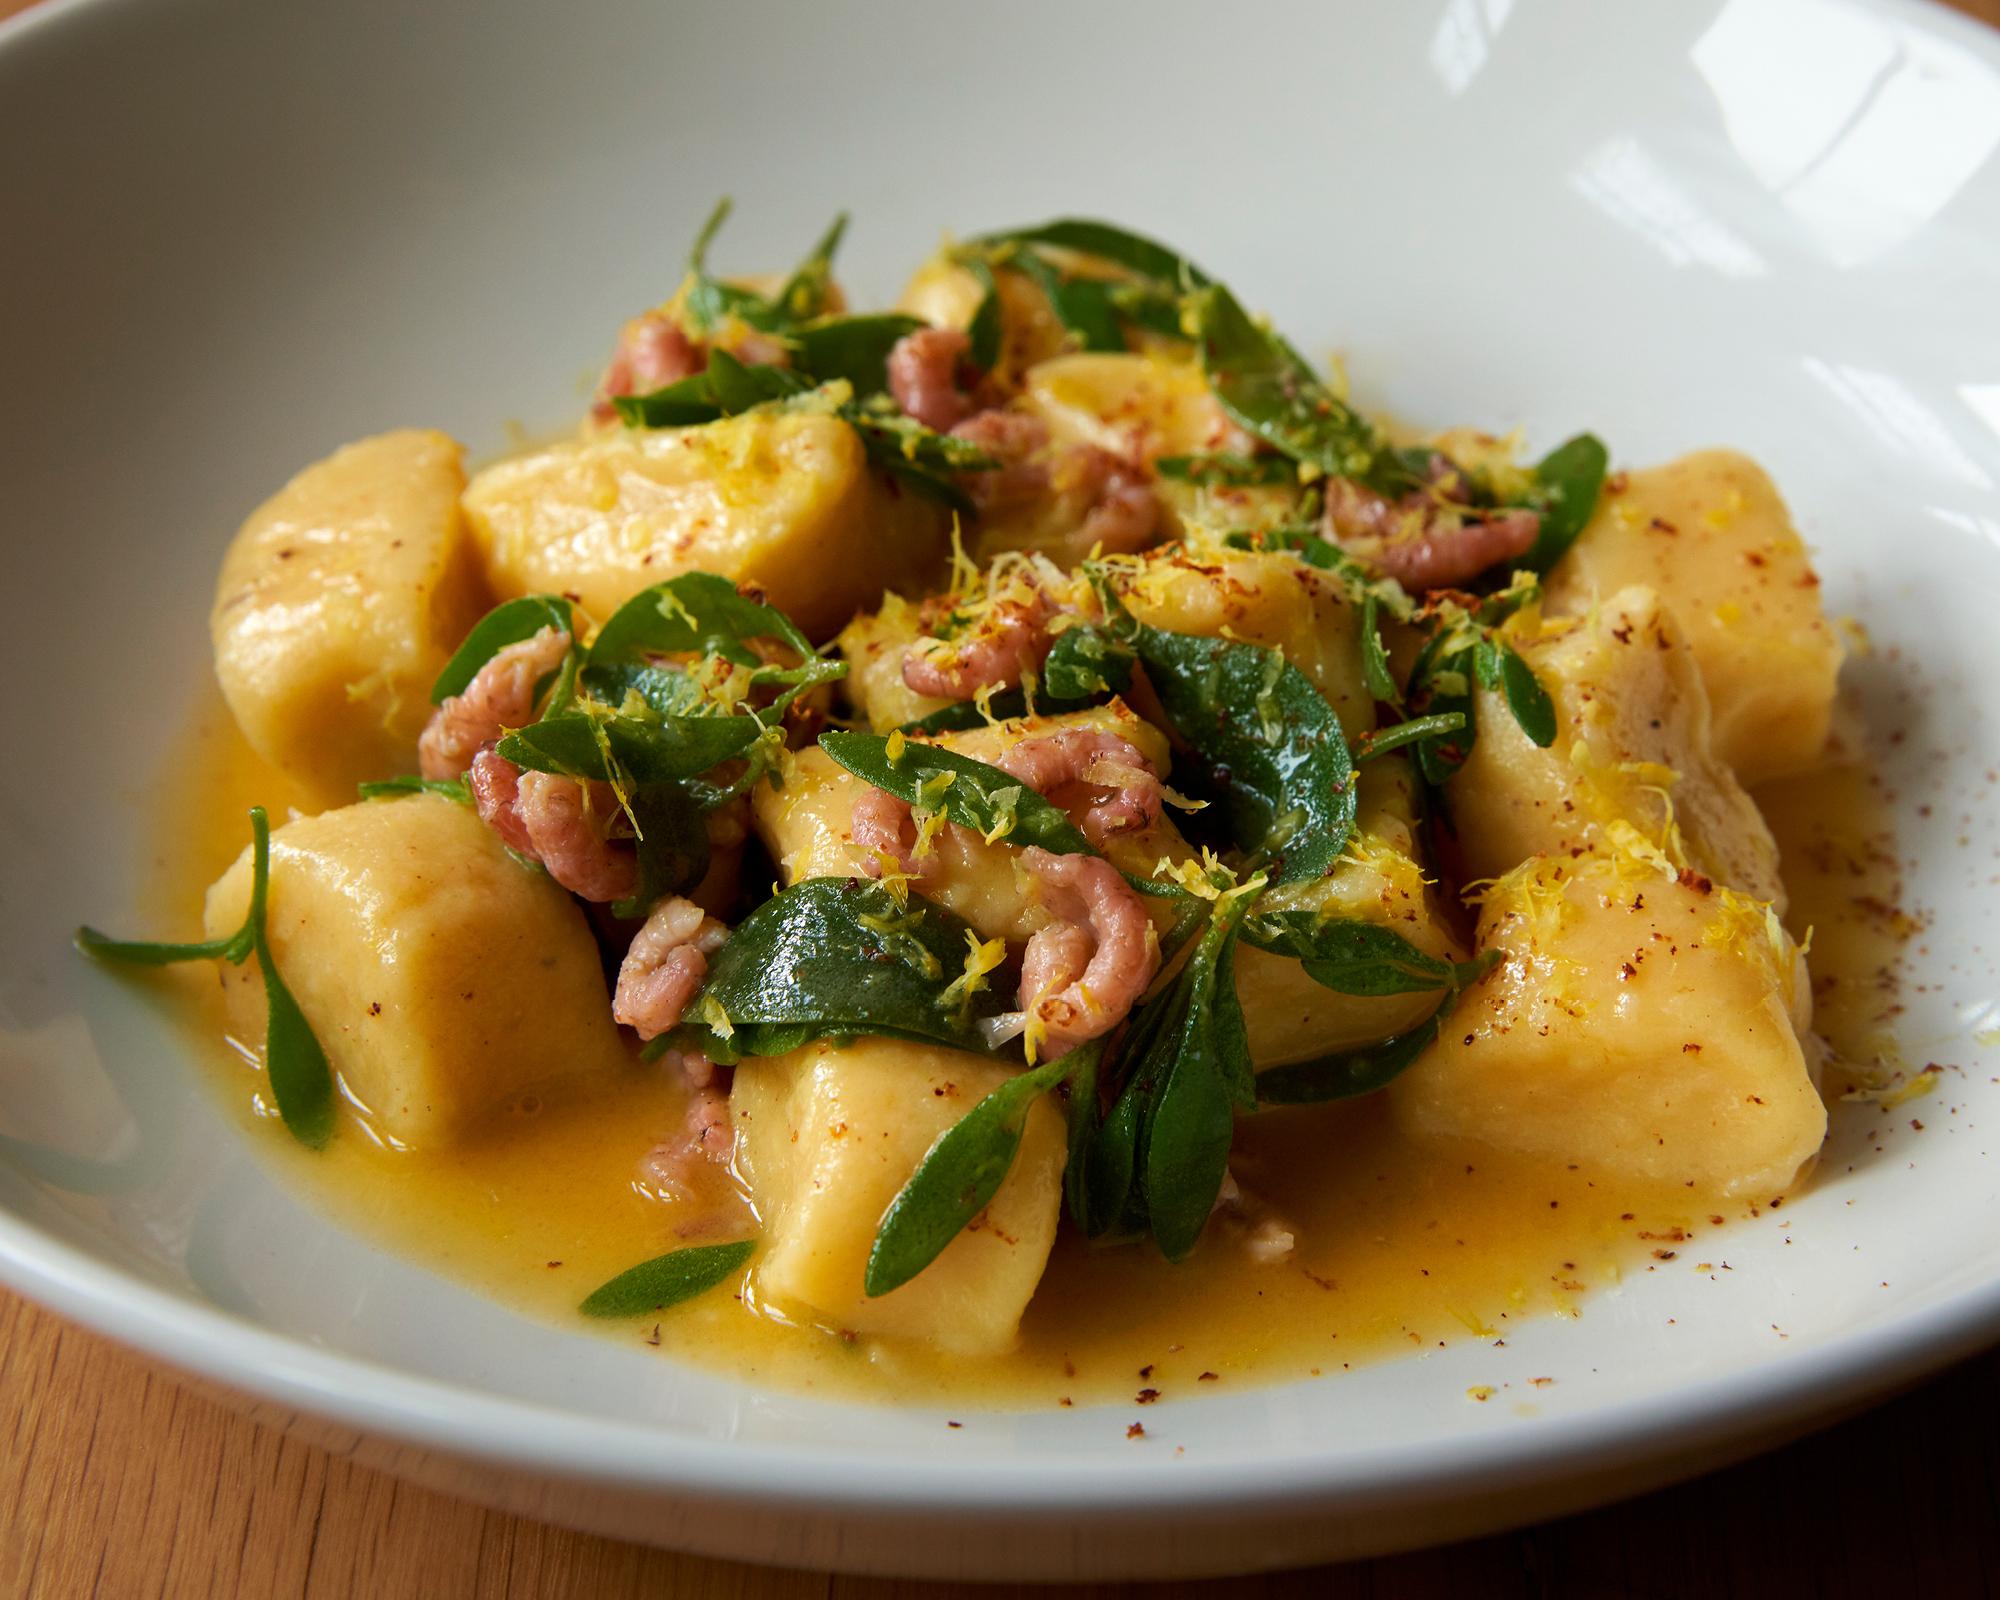 Potato dumplings, potted brown shrimp and sea purslane